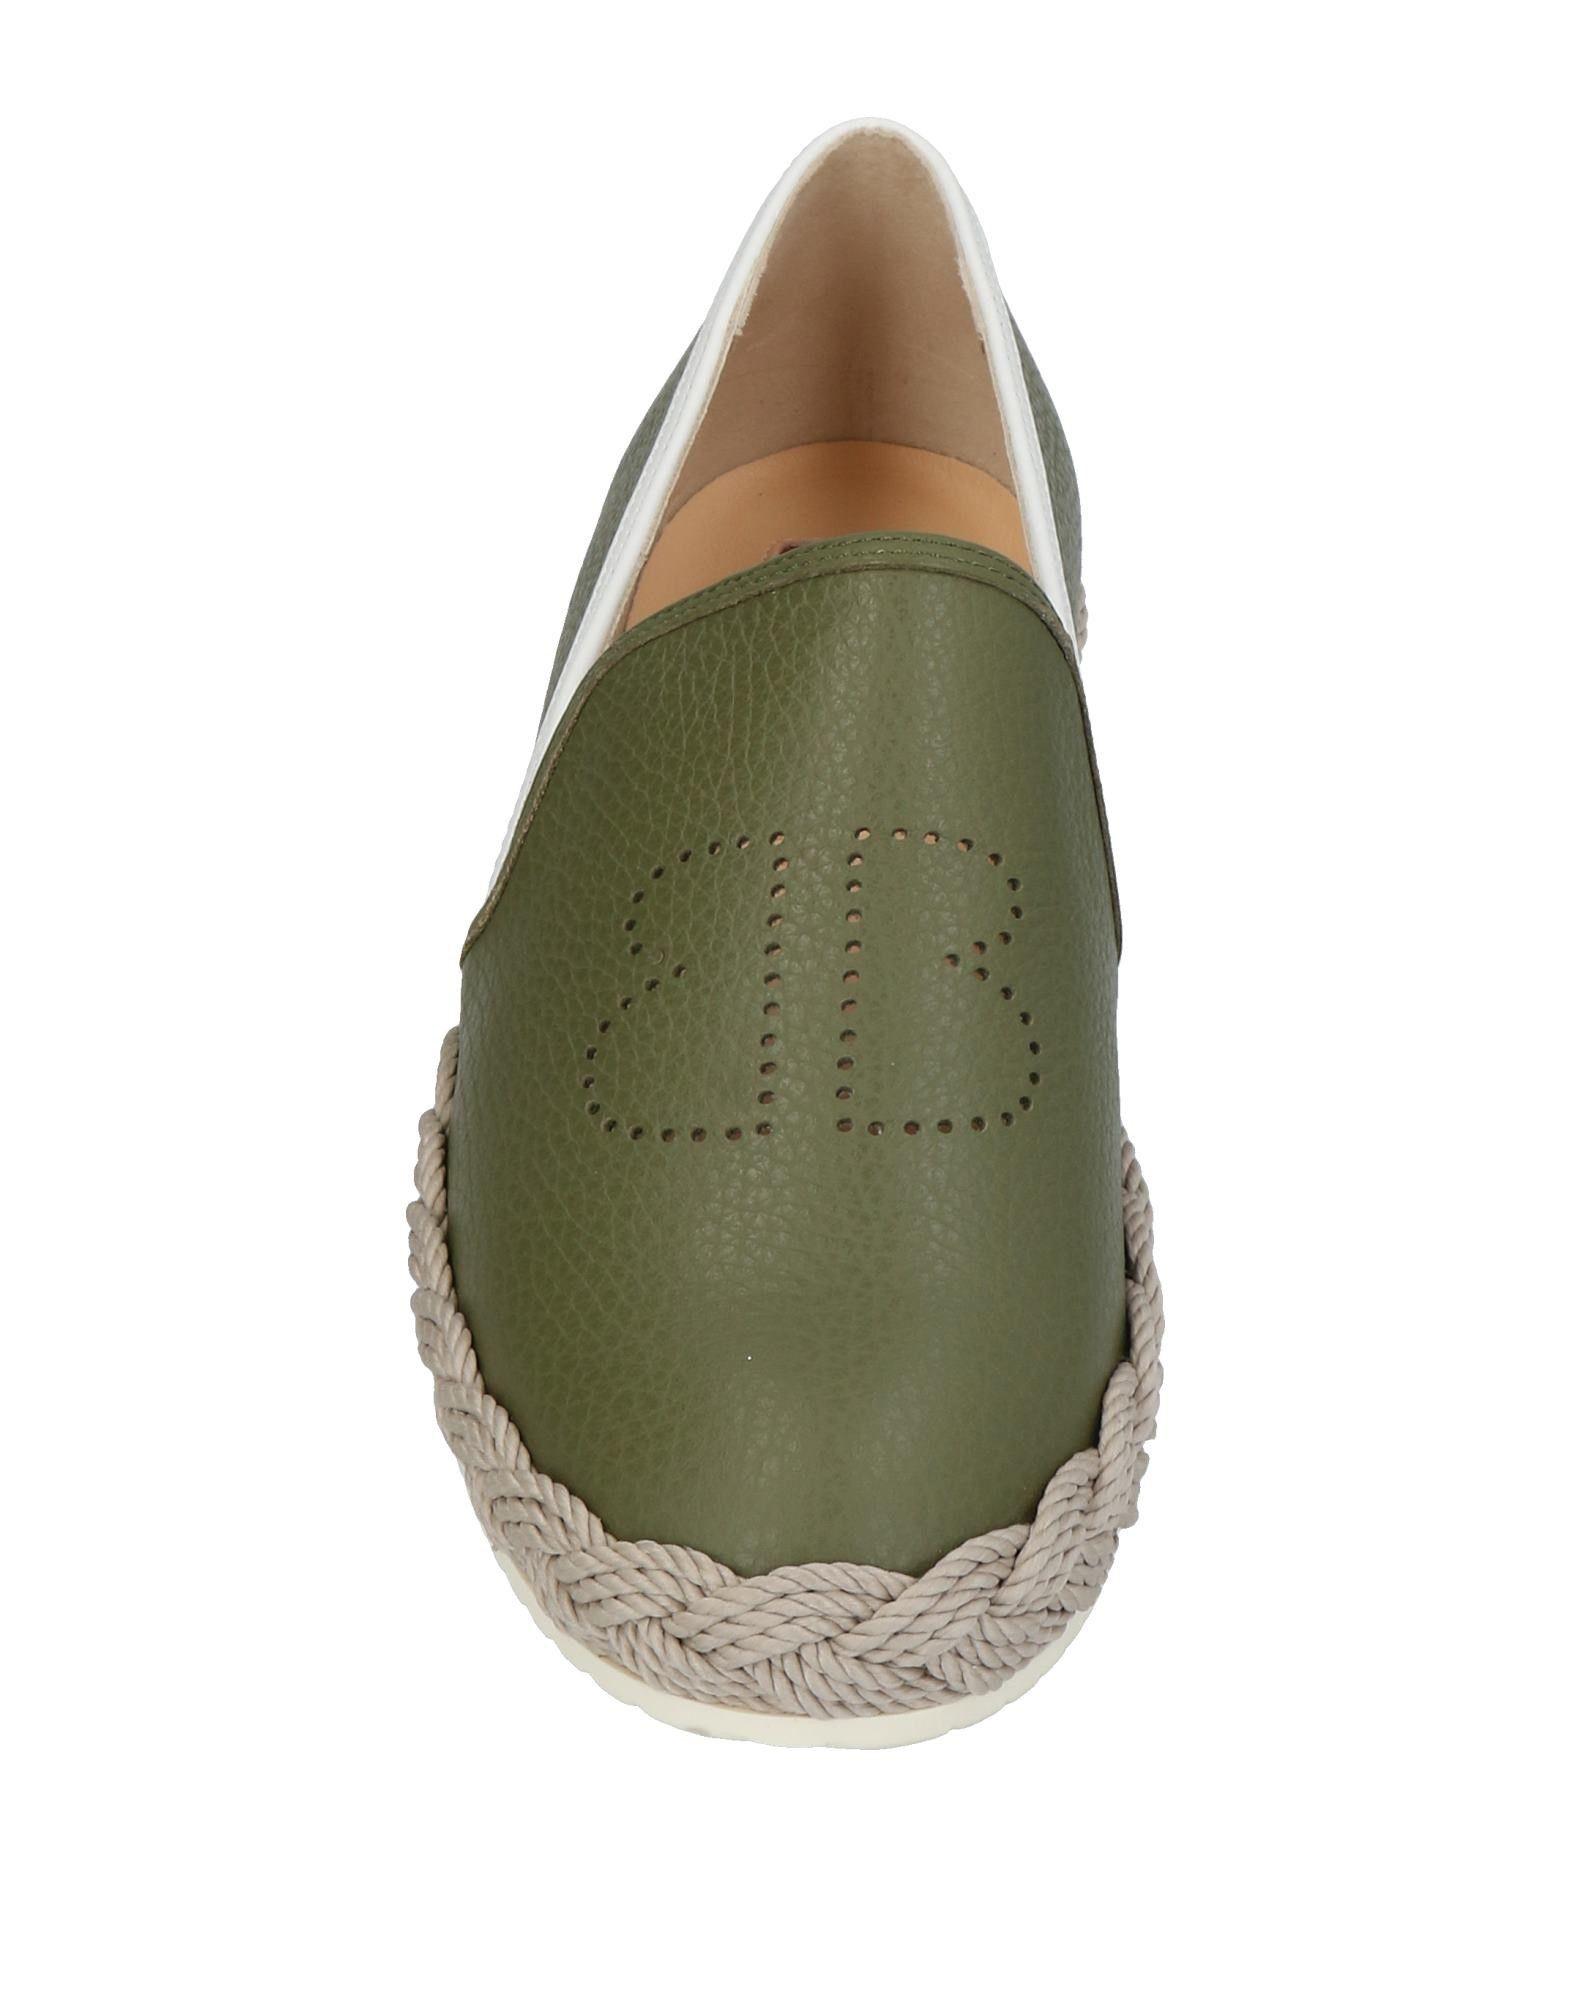 Rabatt Schuhe Ballin Damen Mokassins Damen Ballin  11432497MS ed6066